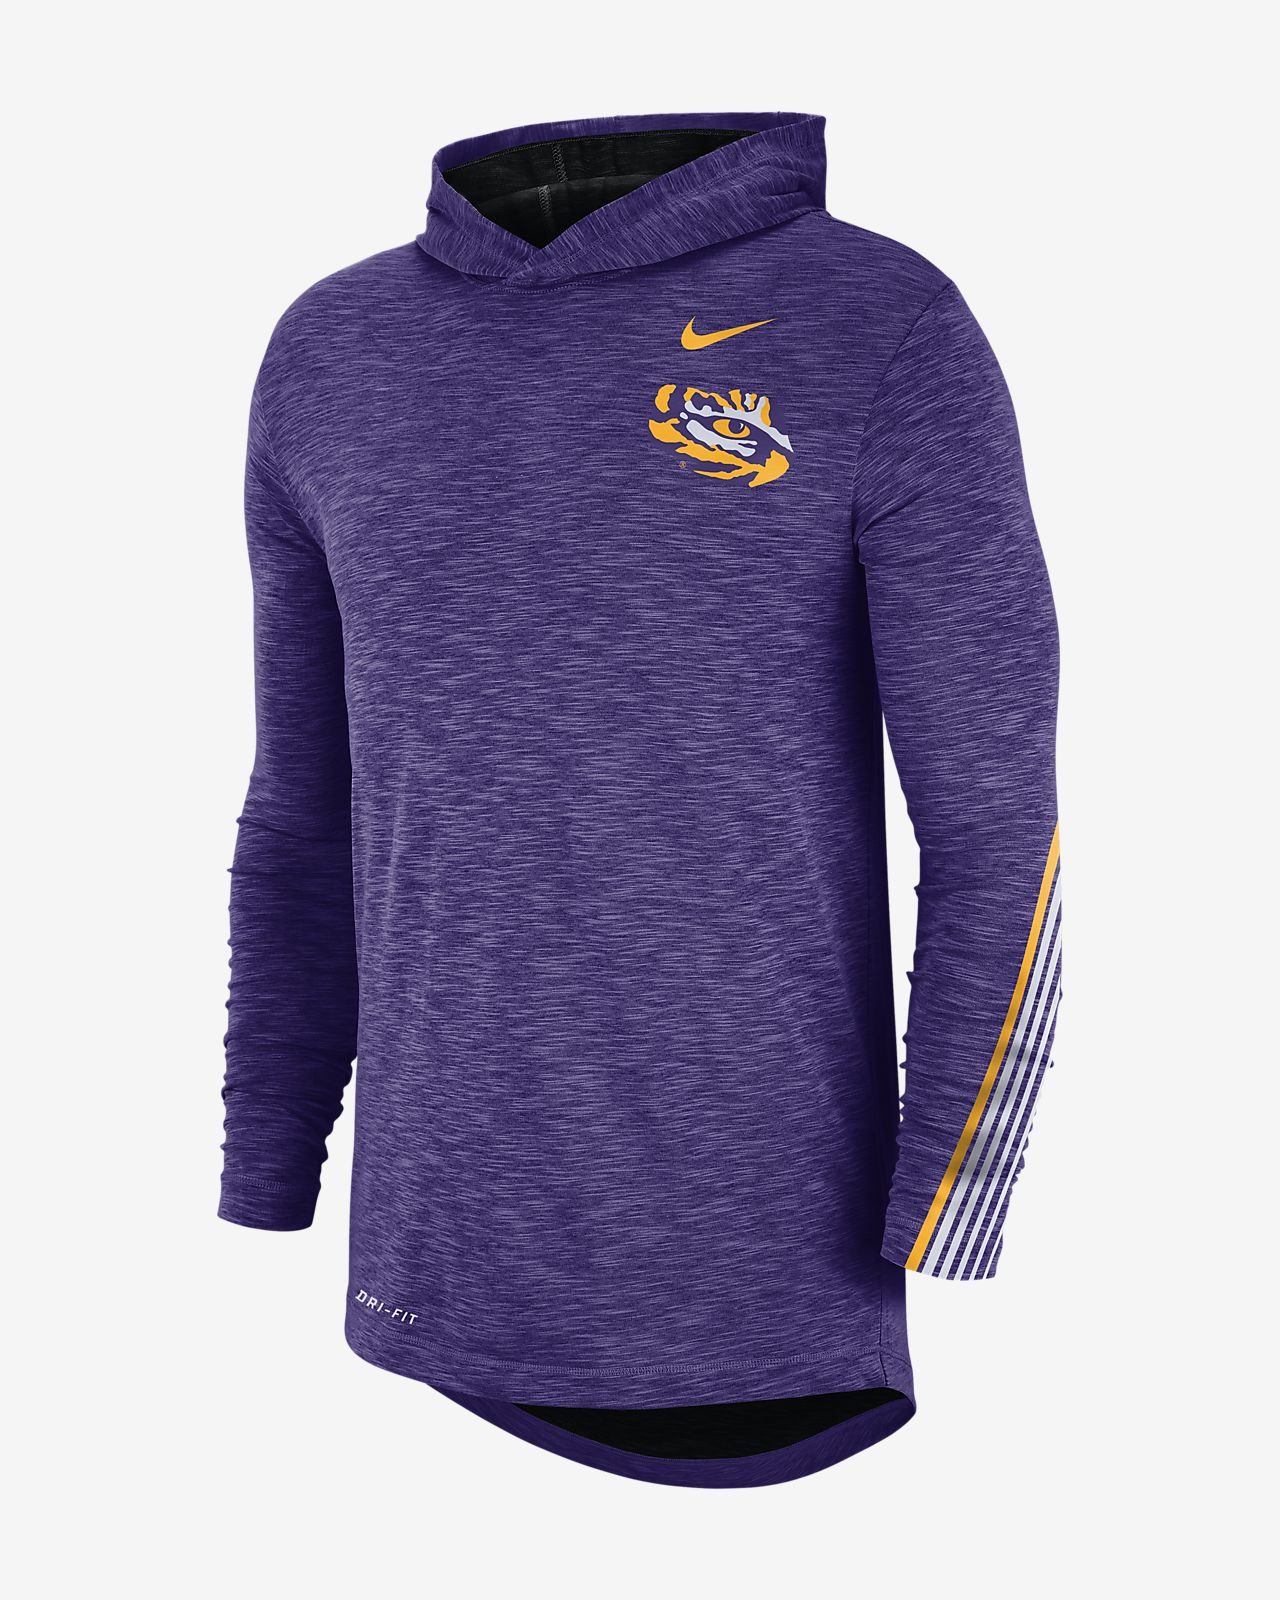 Nike College (LSU) Men's Long-Sleeve Hooded T-Shirt